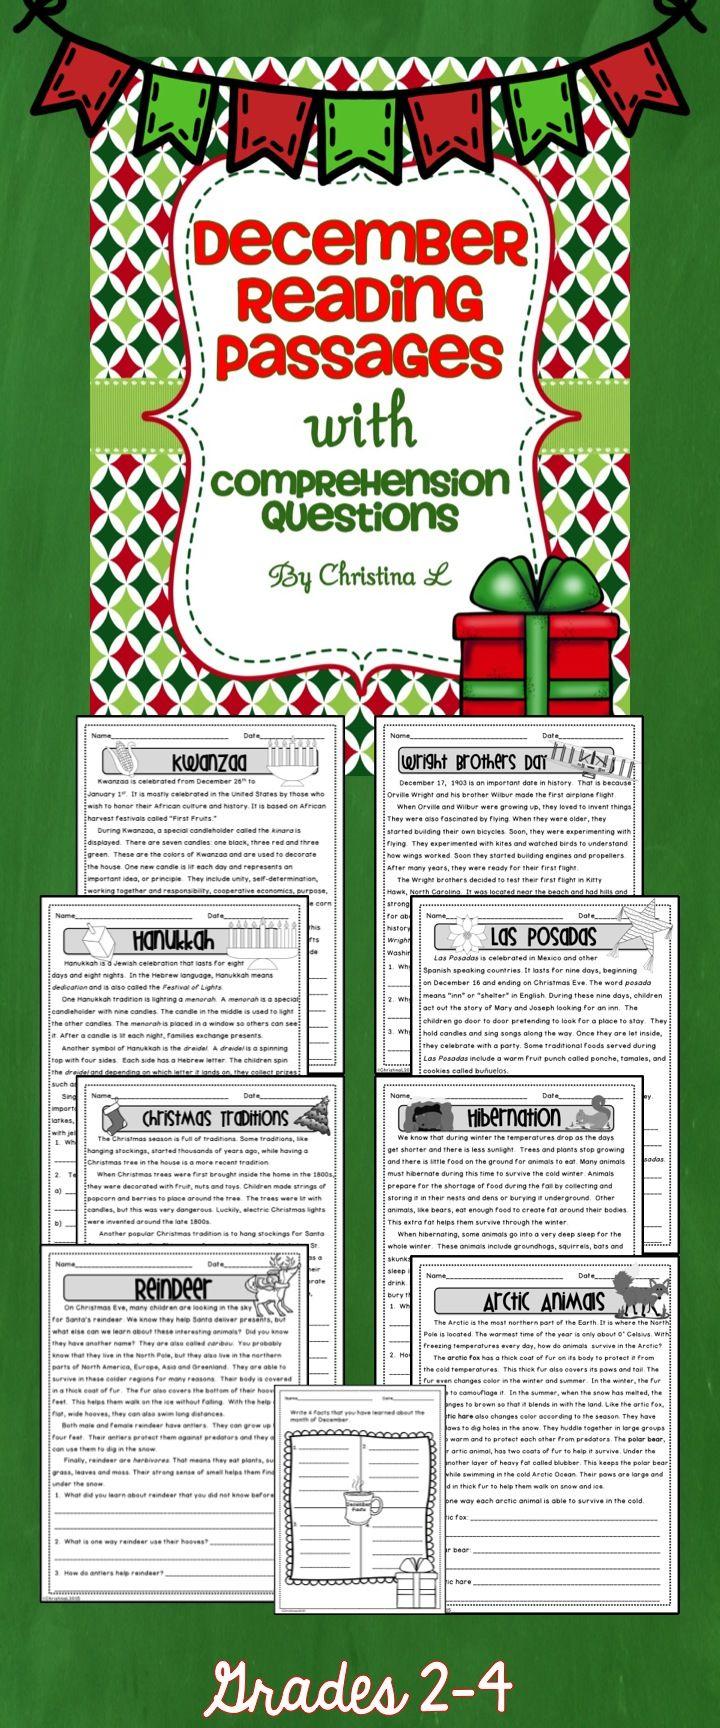 December Reading Passages Reading passages, Third grade